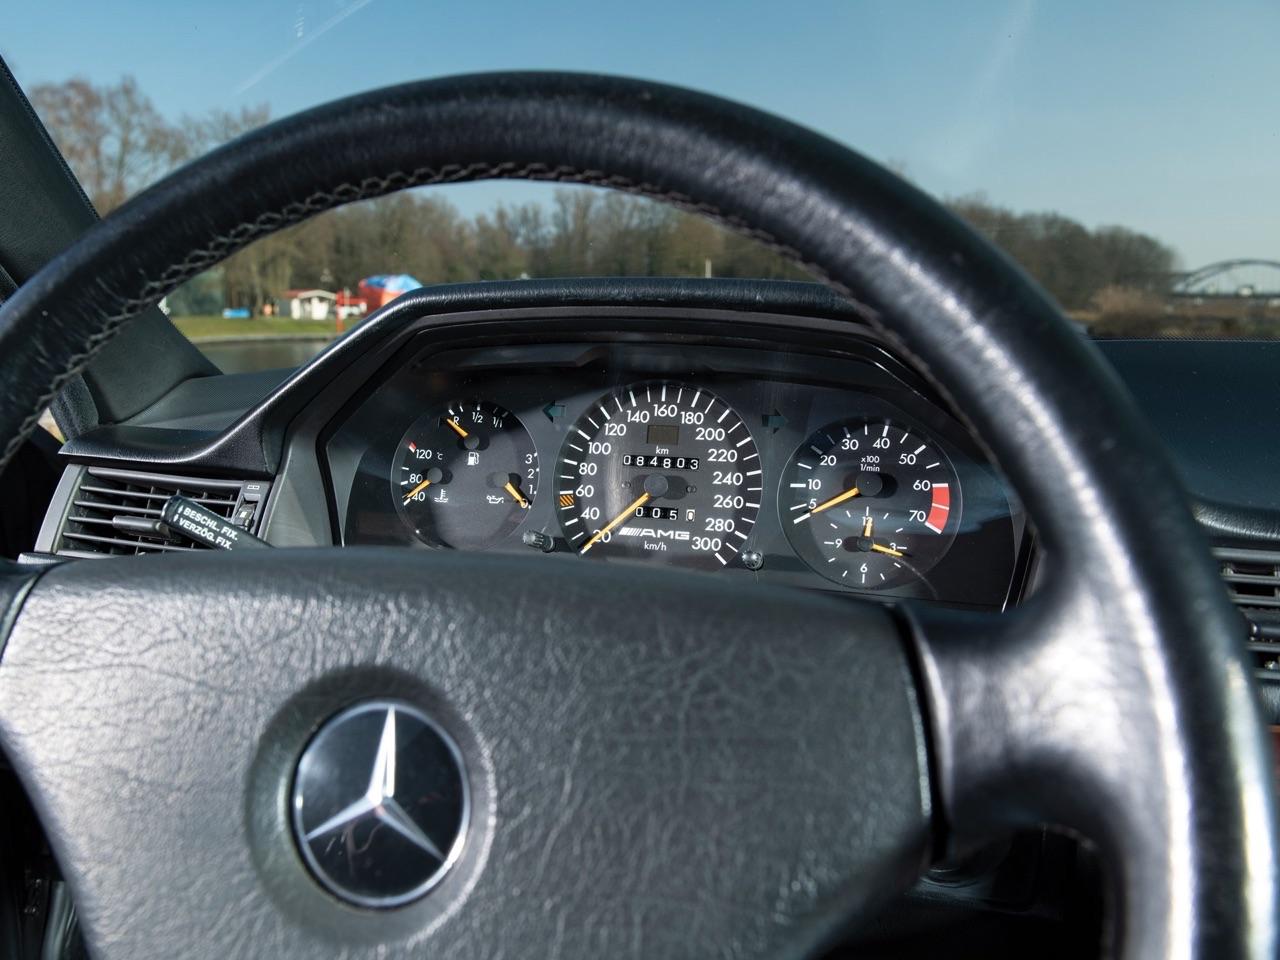 Mercedes 500E AMG 6.0... Autobahn queen ! 30